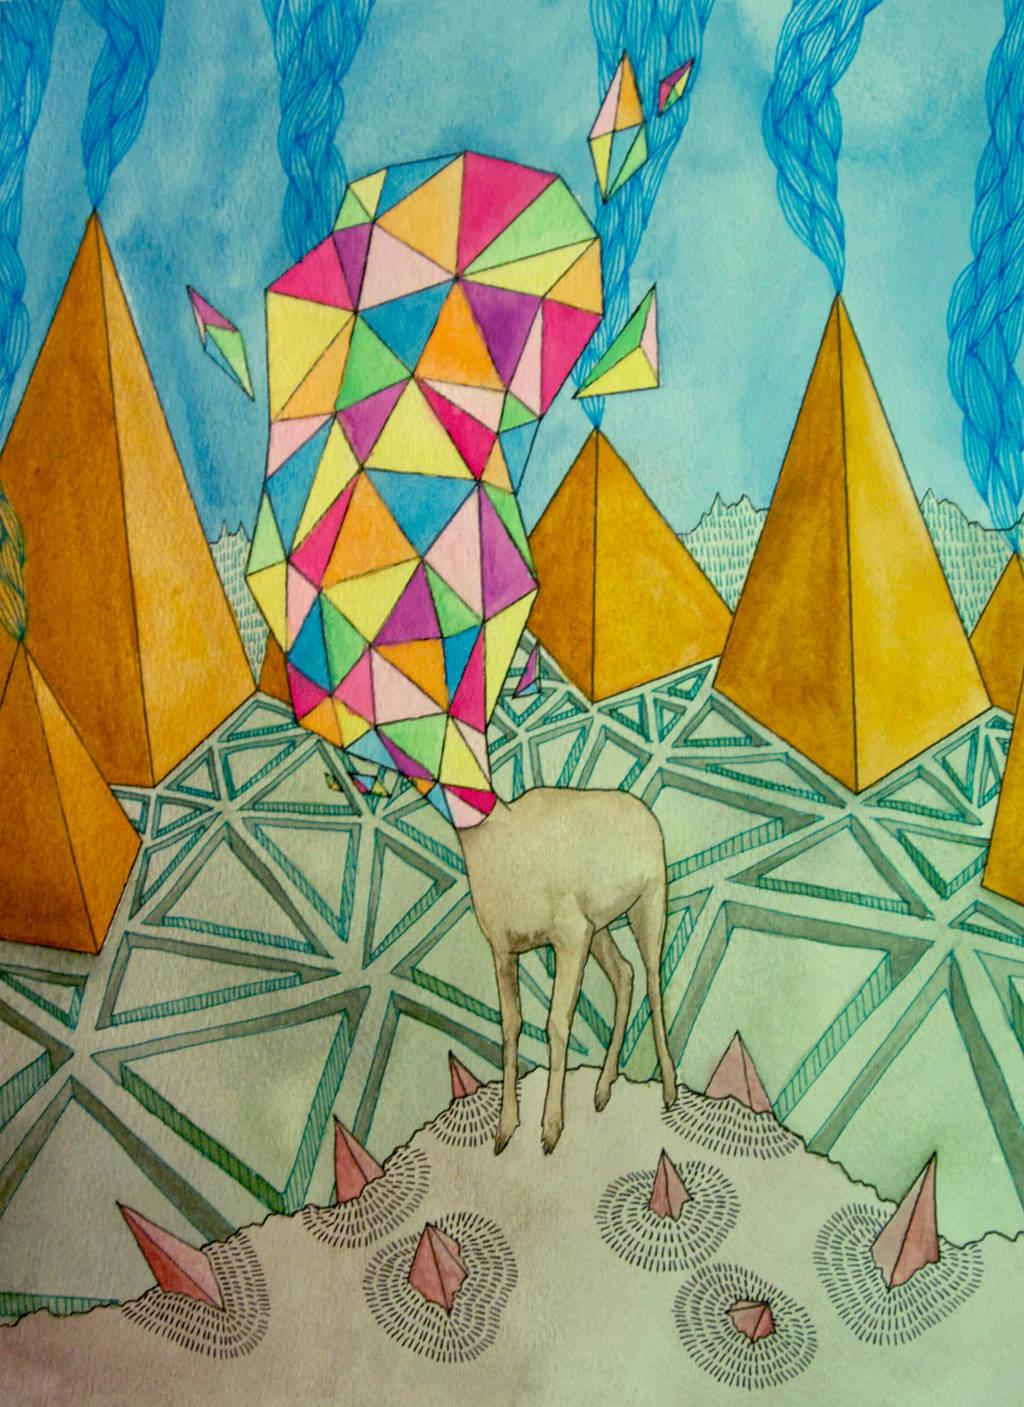 Expanse by Ayzlyn